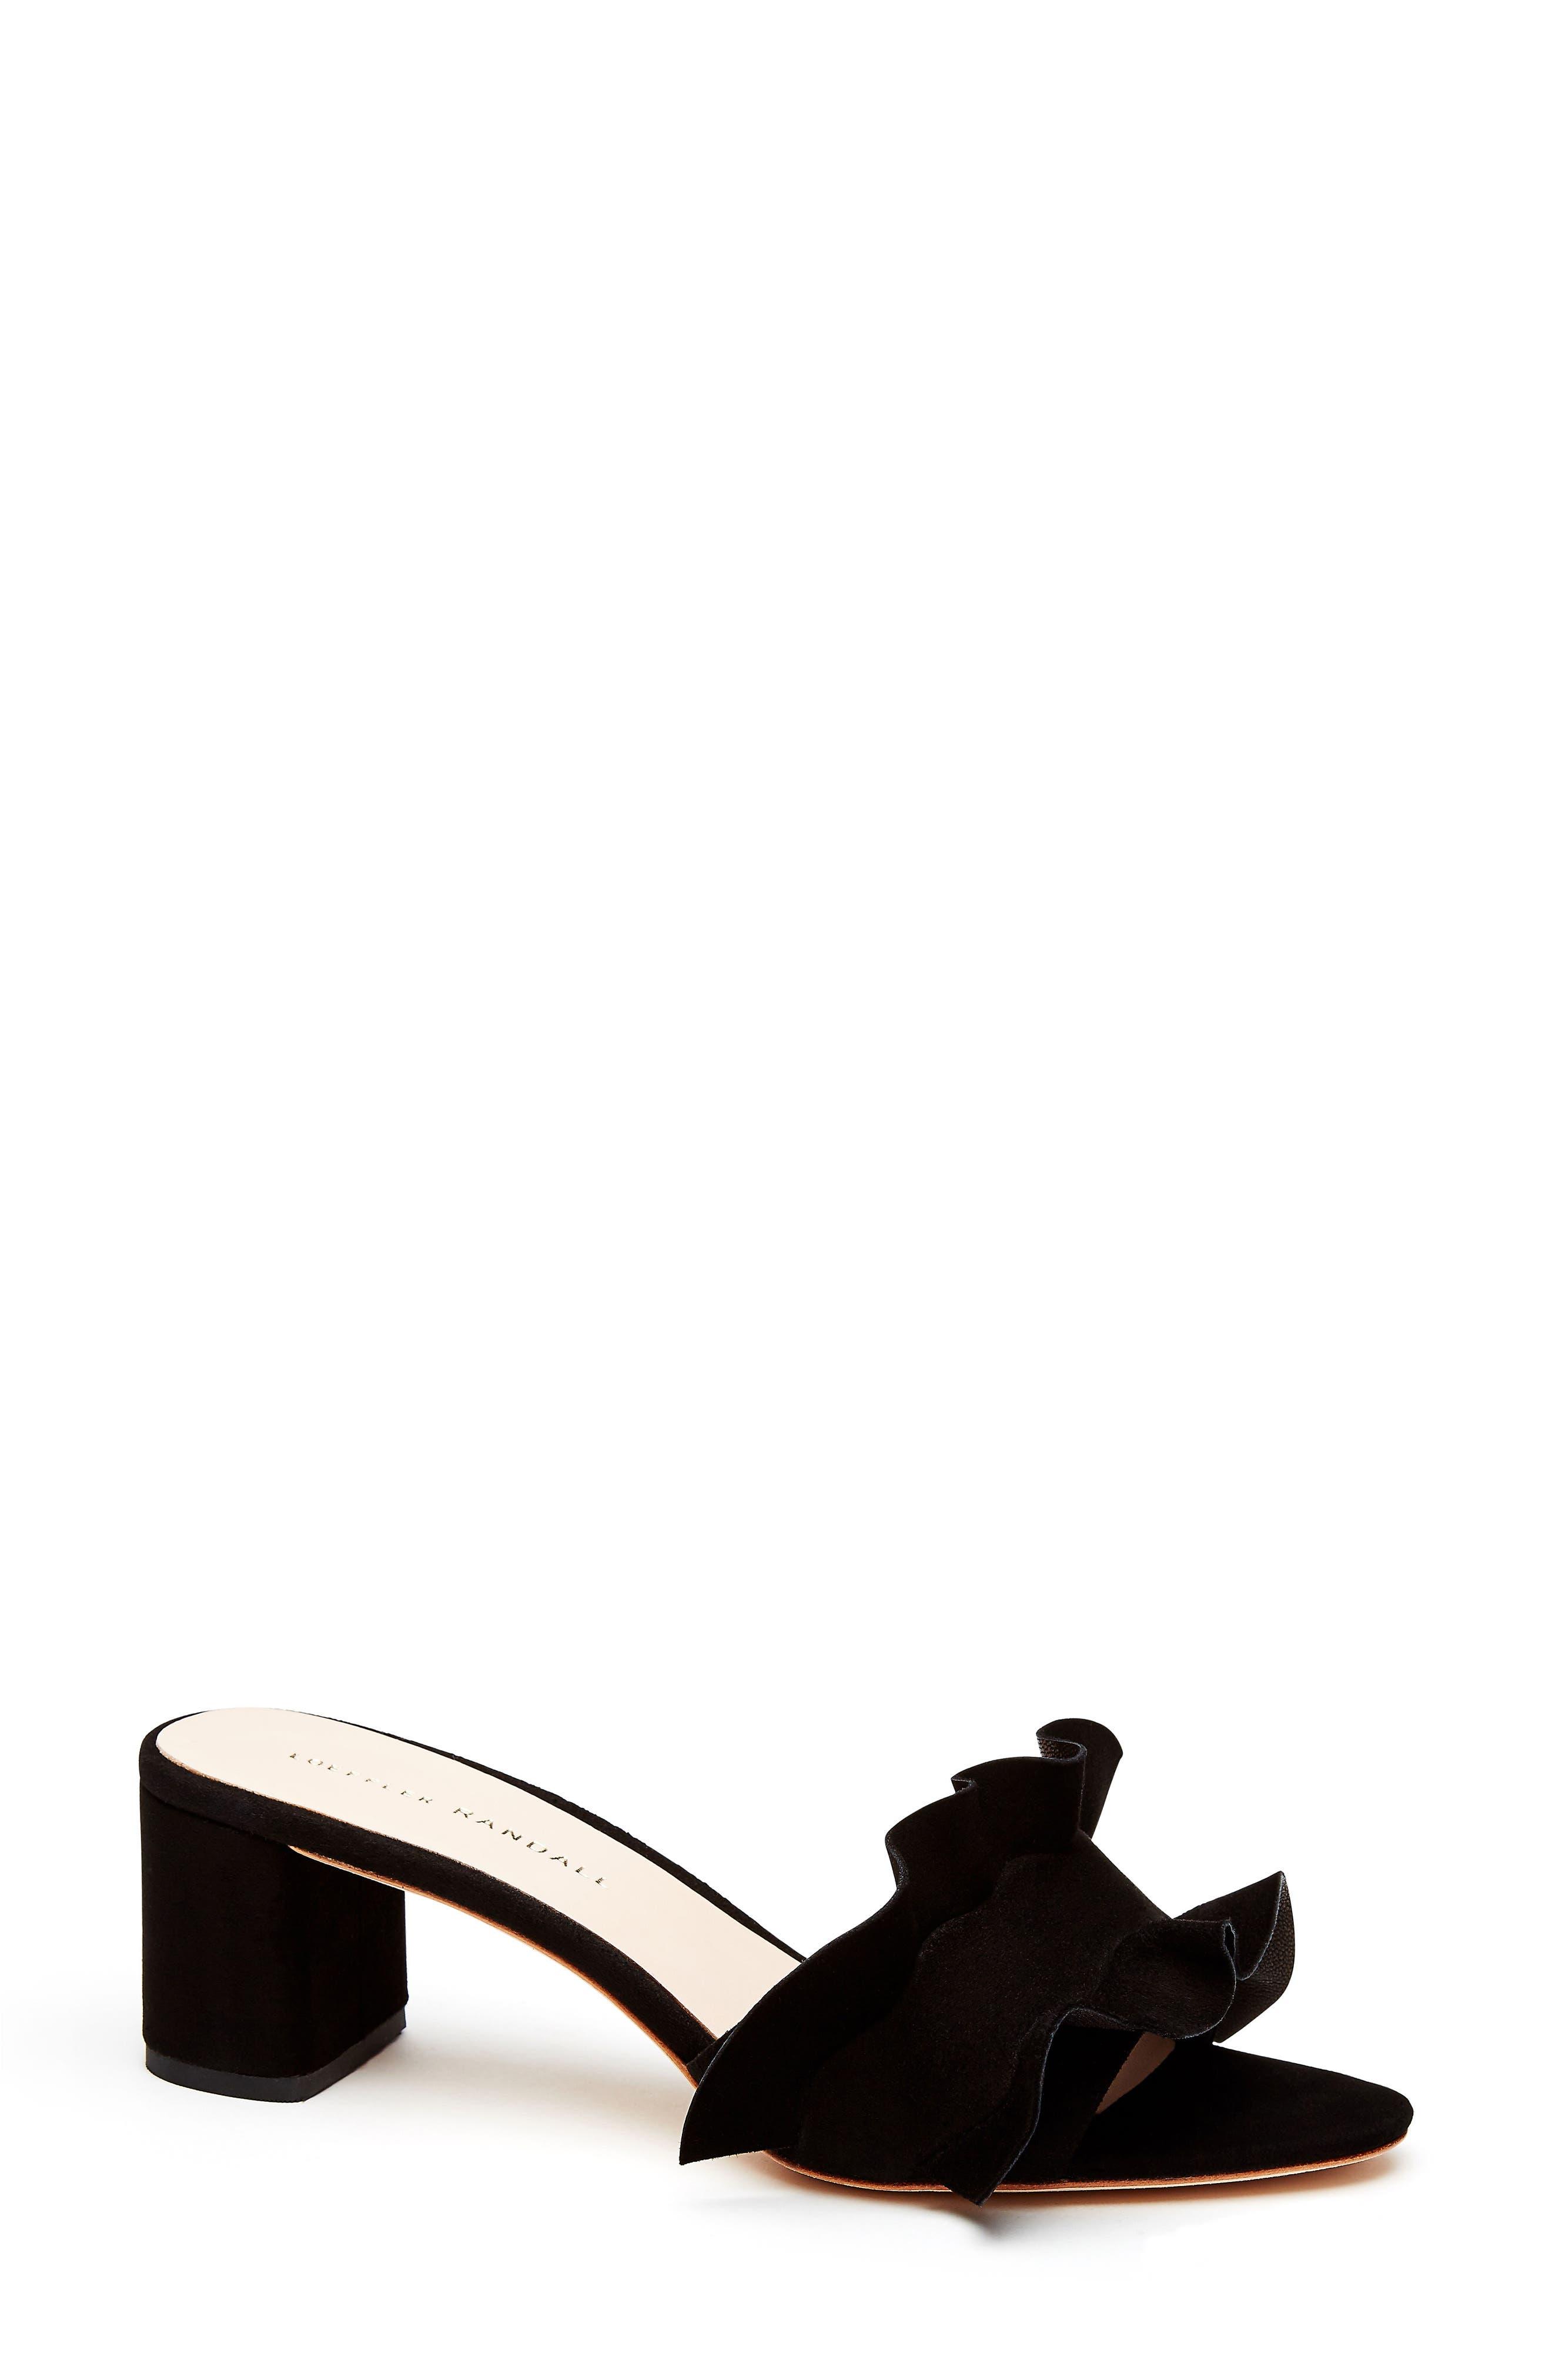 Vera Ruffled Slide Sandal,                             Main thumbnail 1, color,                             Black Suede